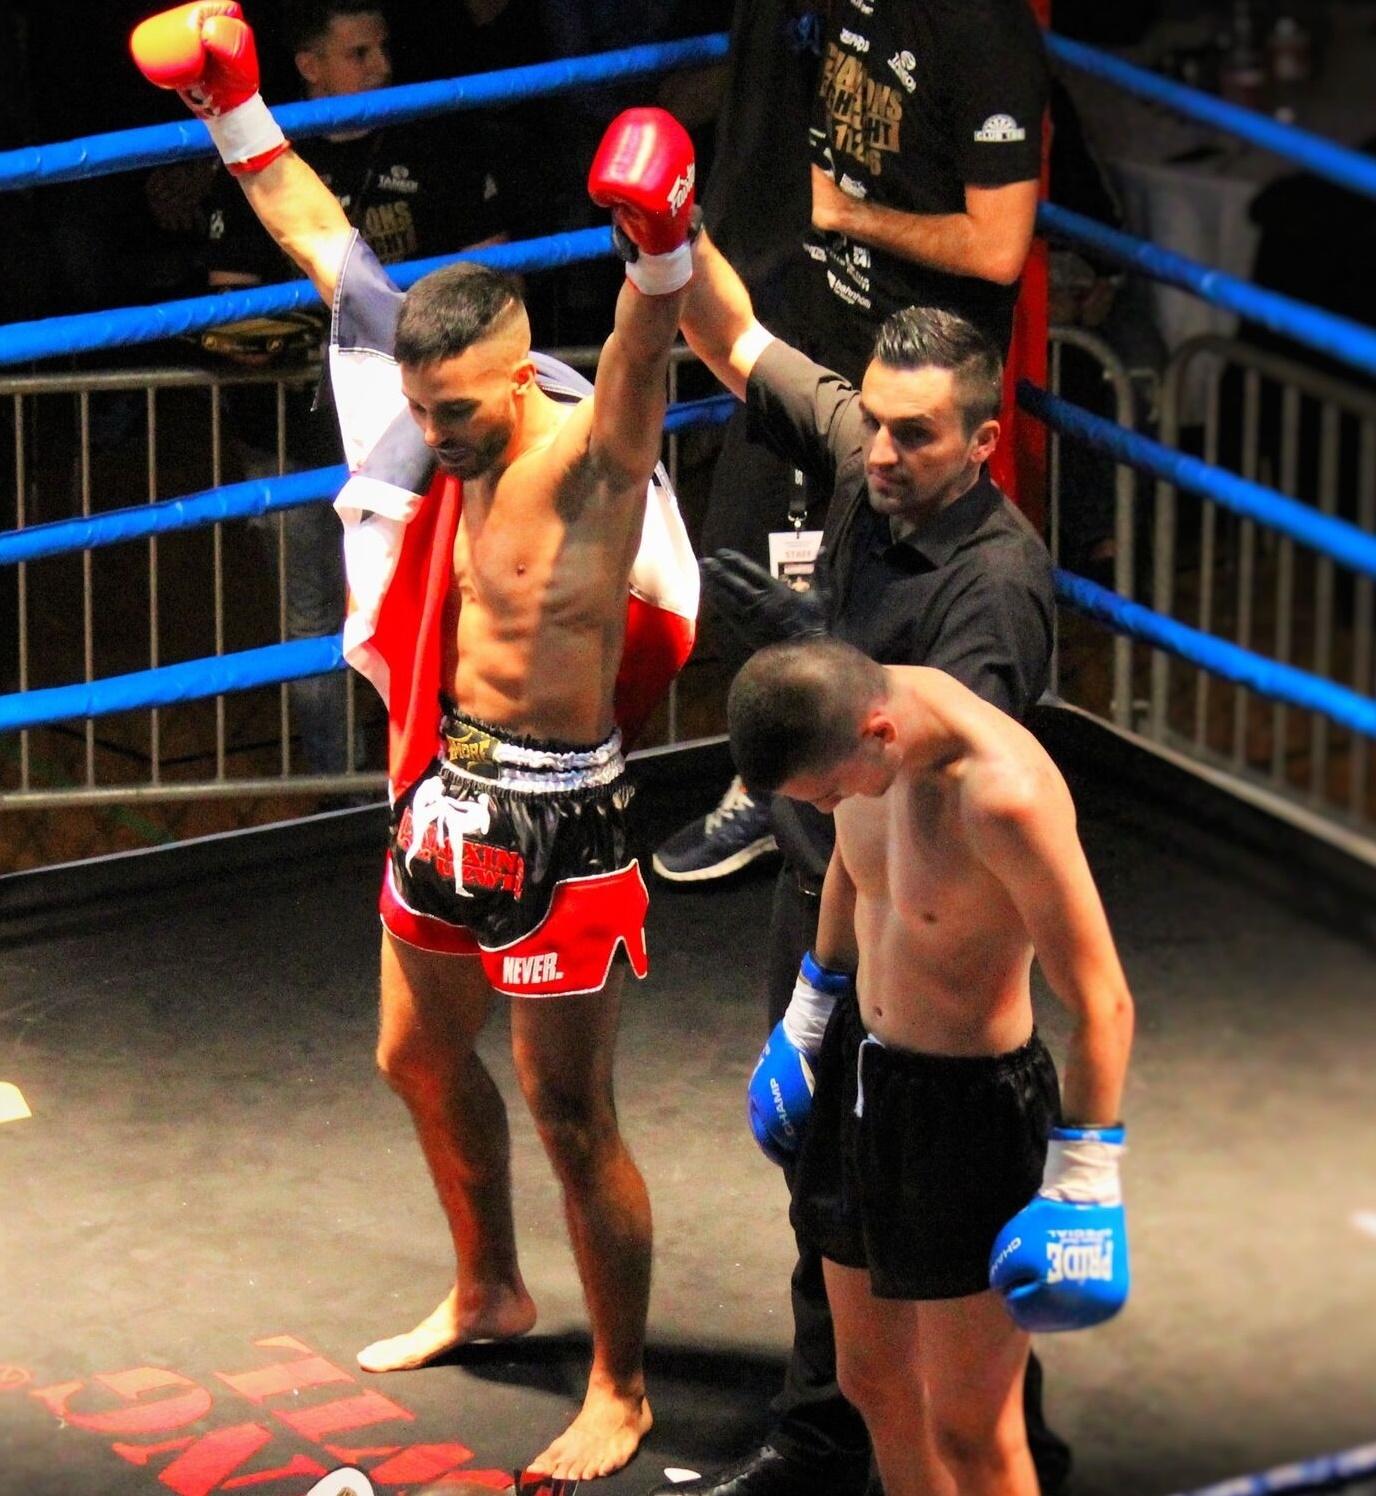 sm2016_kickboxing_daniele-erni_sieger_regiosport_1376